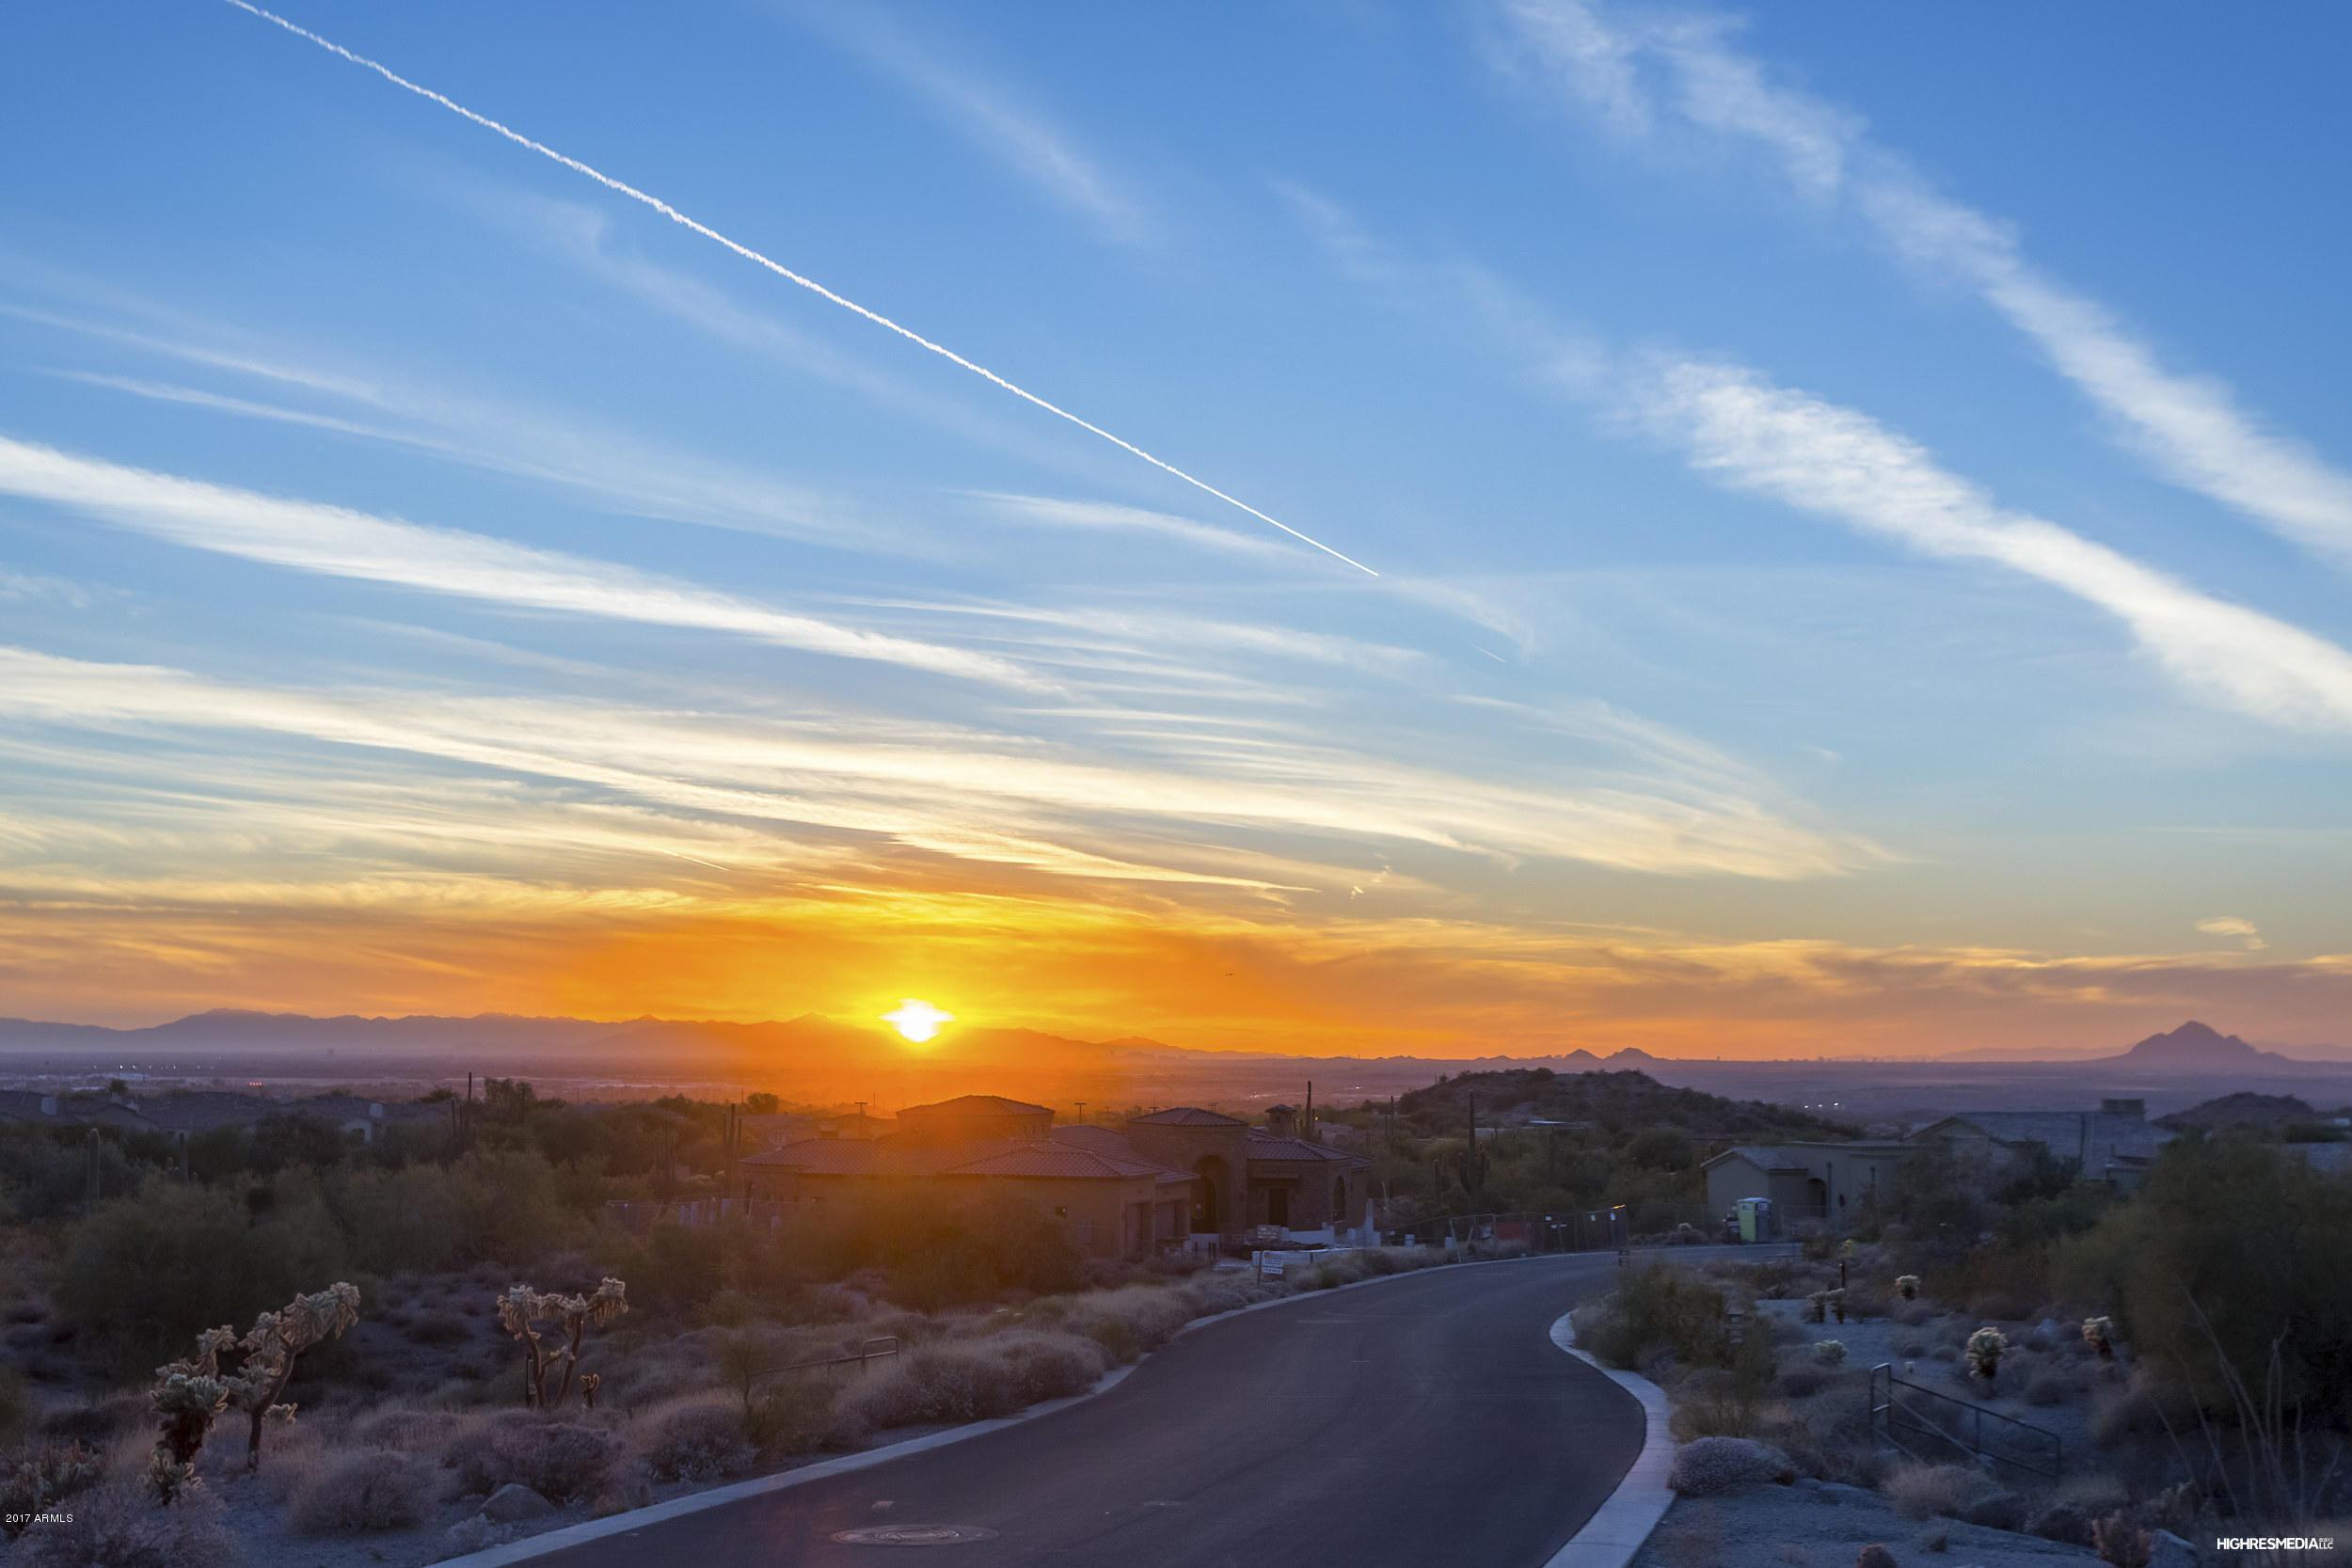 MLS 5912453 4327 N SONORAN HEIGHTS Circle, Mesa, AZ 85207